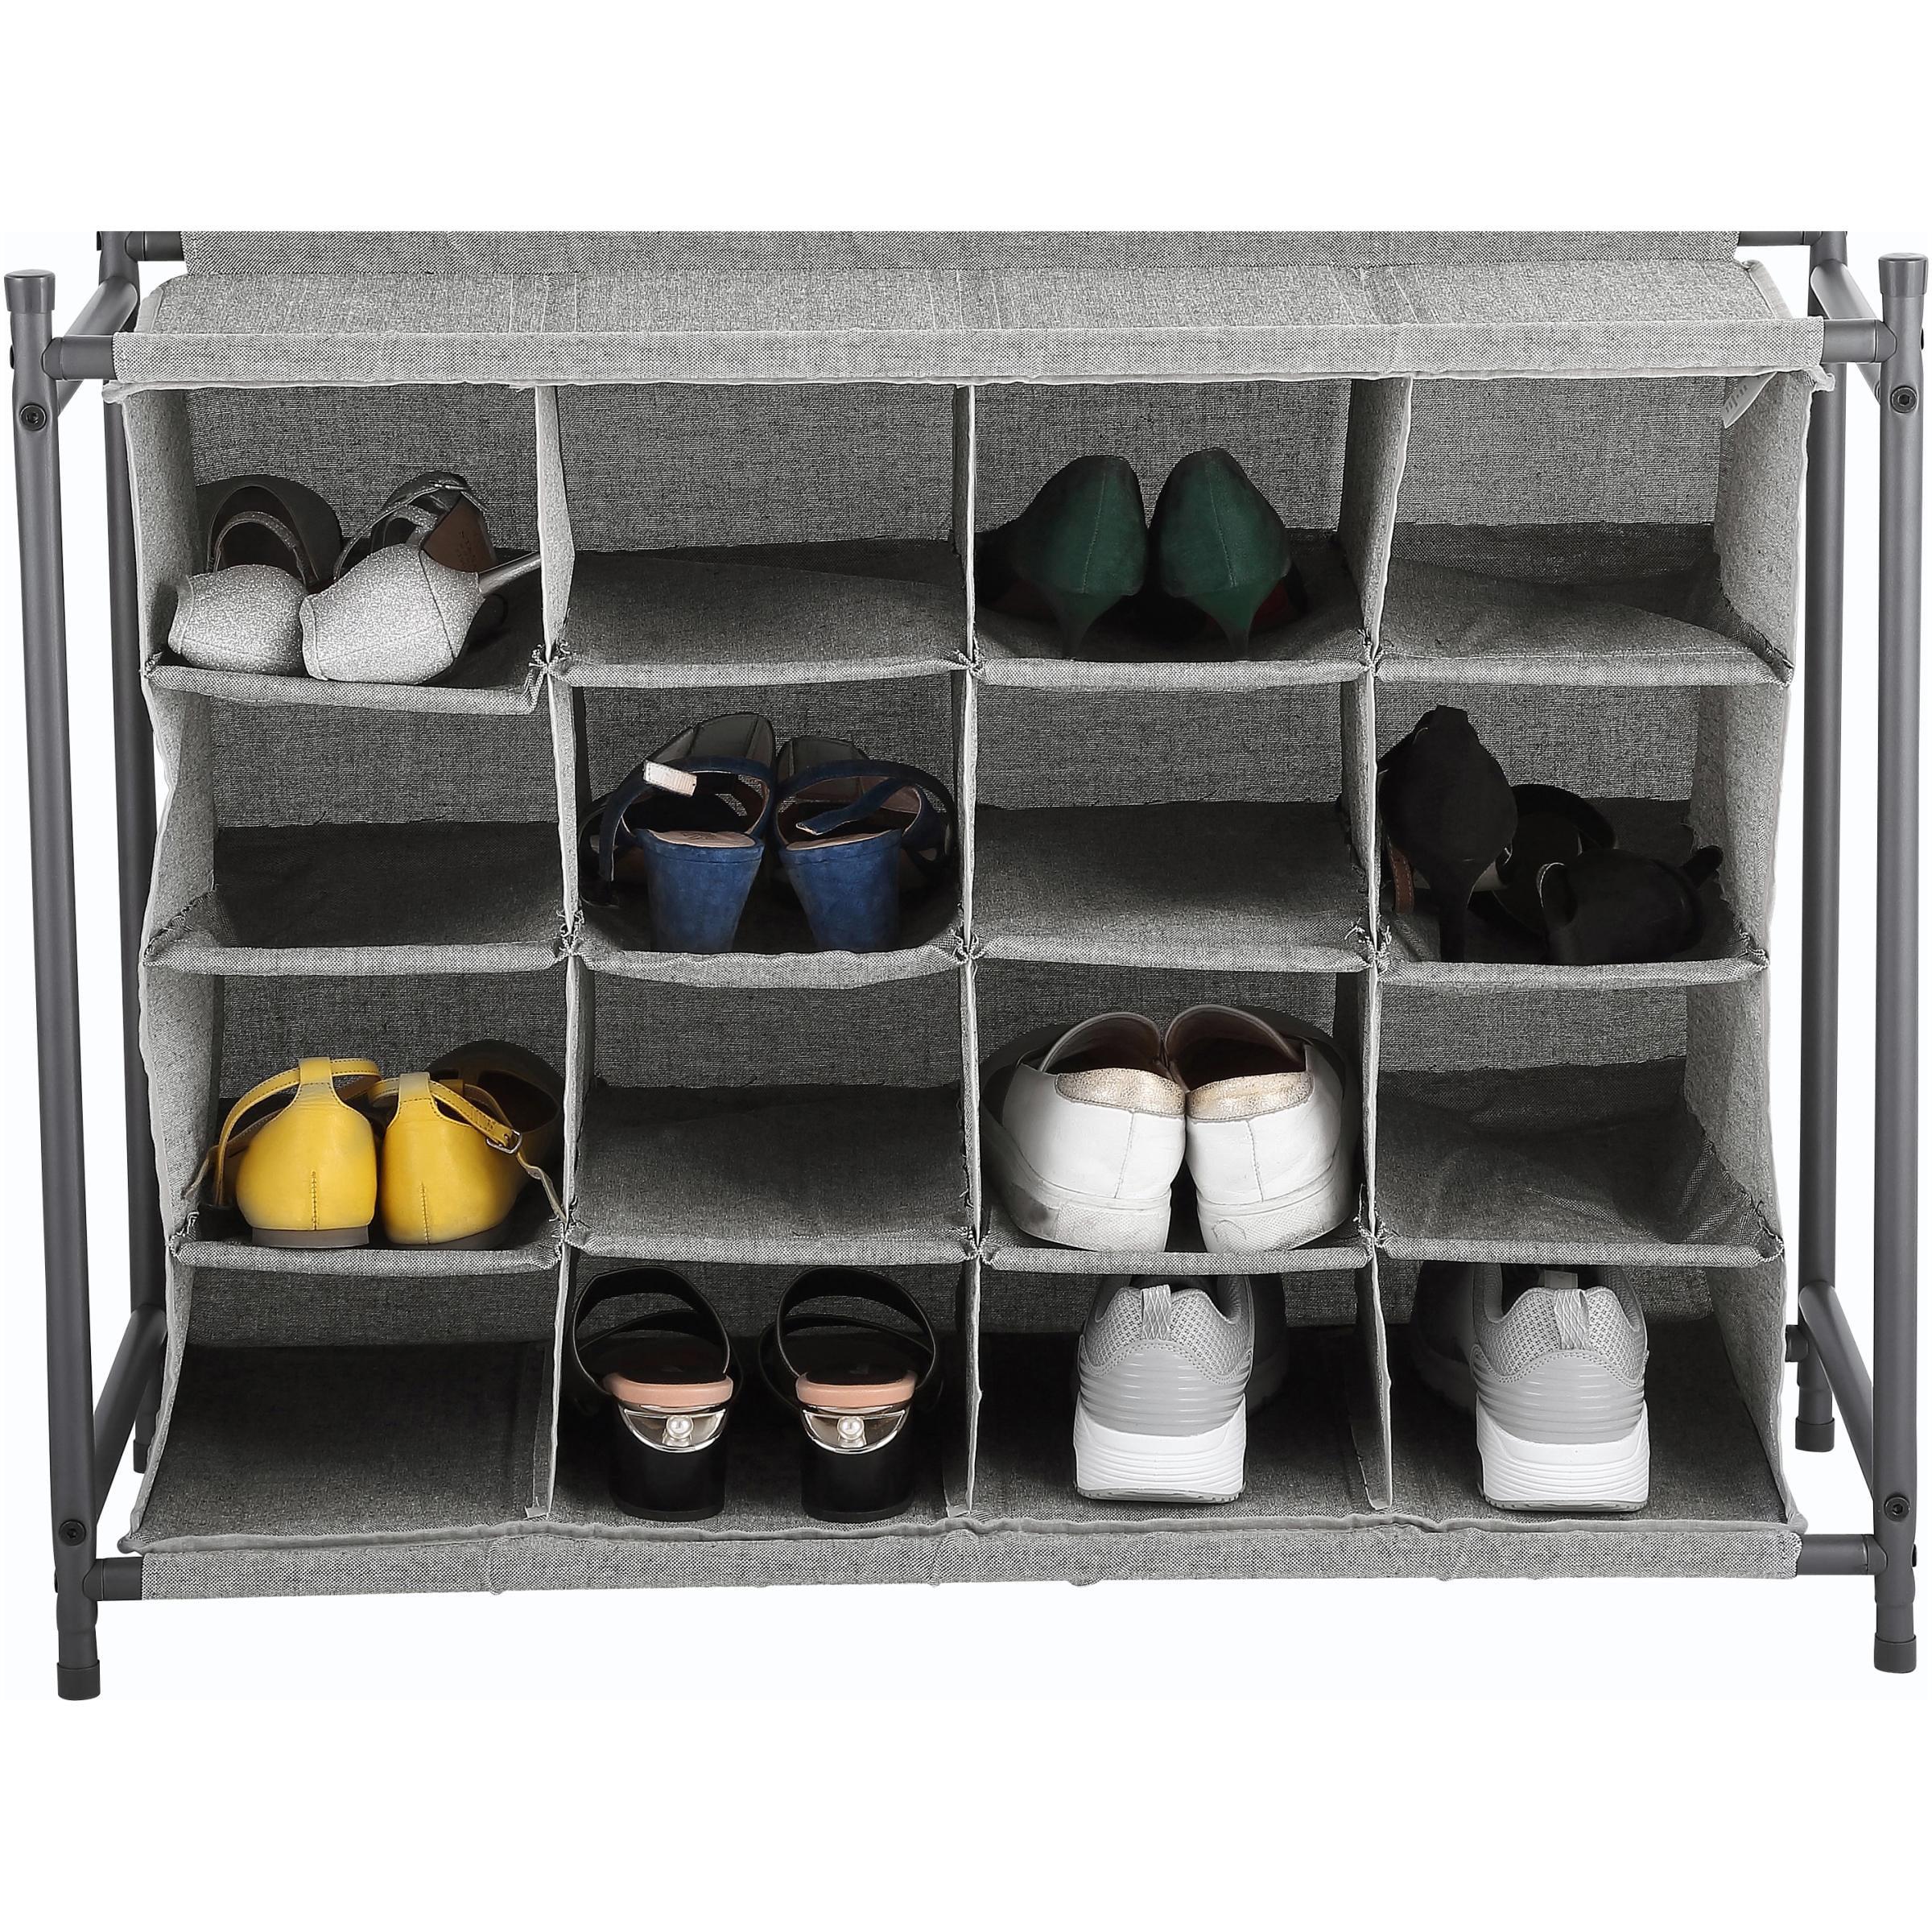 Better Homes & Gardens Charleston Collection 16-Pair Shoe Organizer